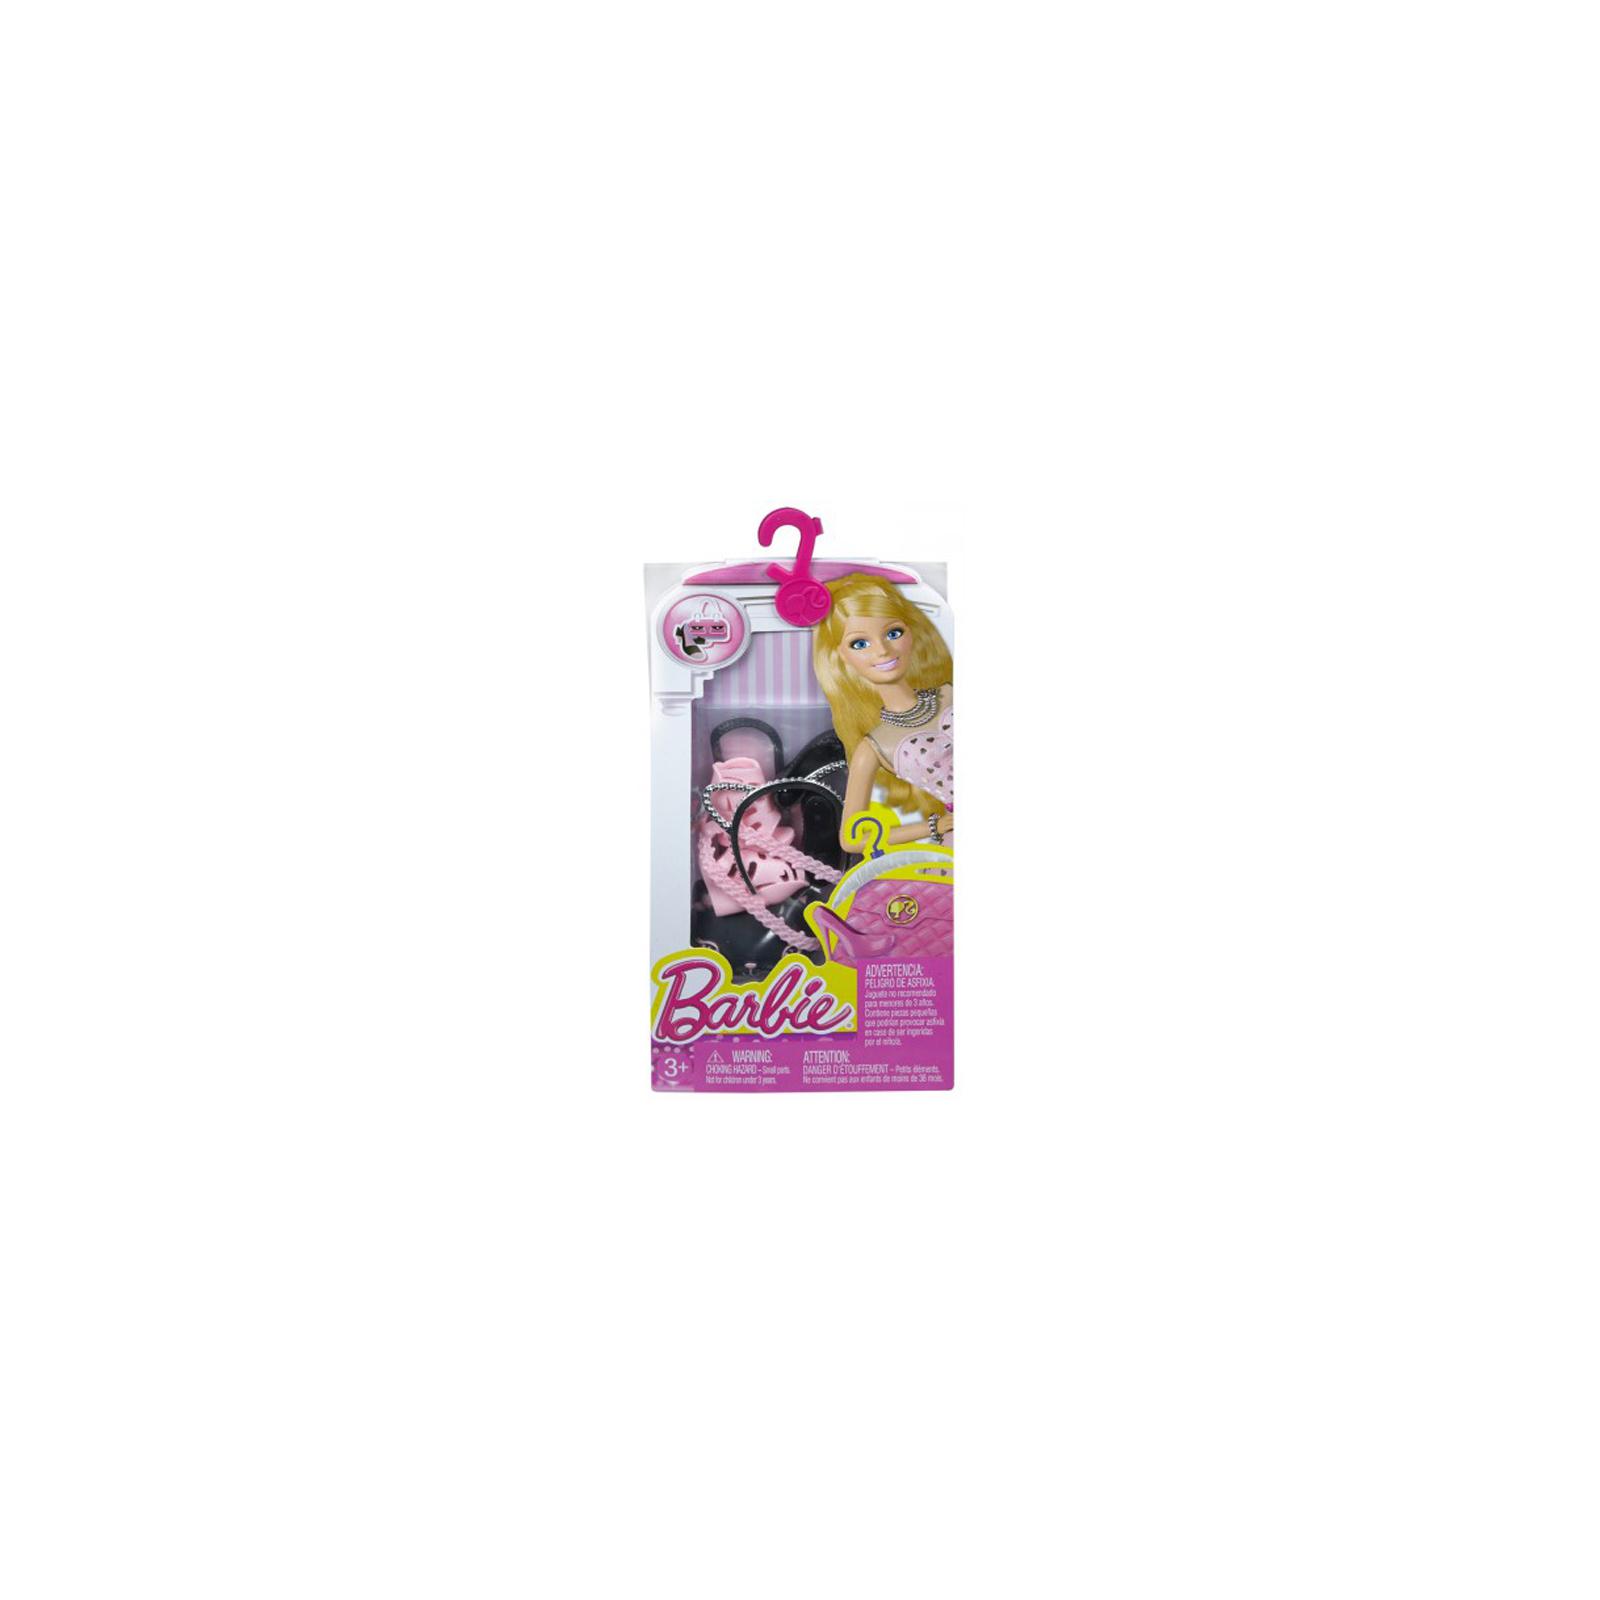 Аксессуар к кукле BARBIE Кошечка (CFX30-1) изображение 2